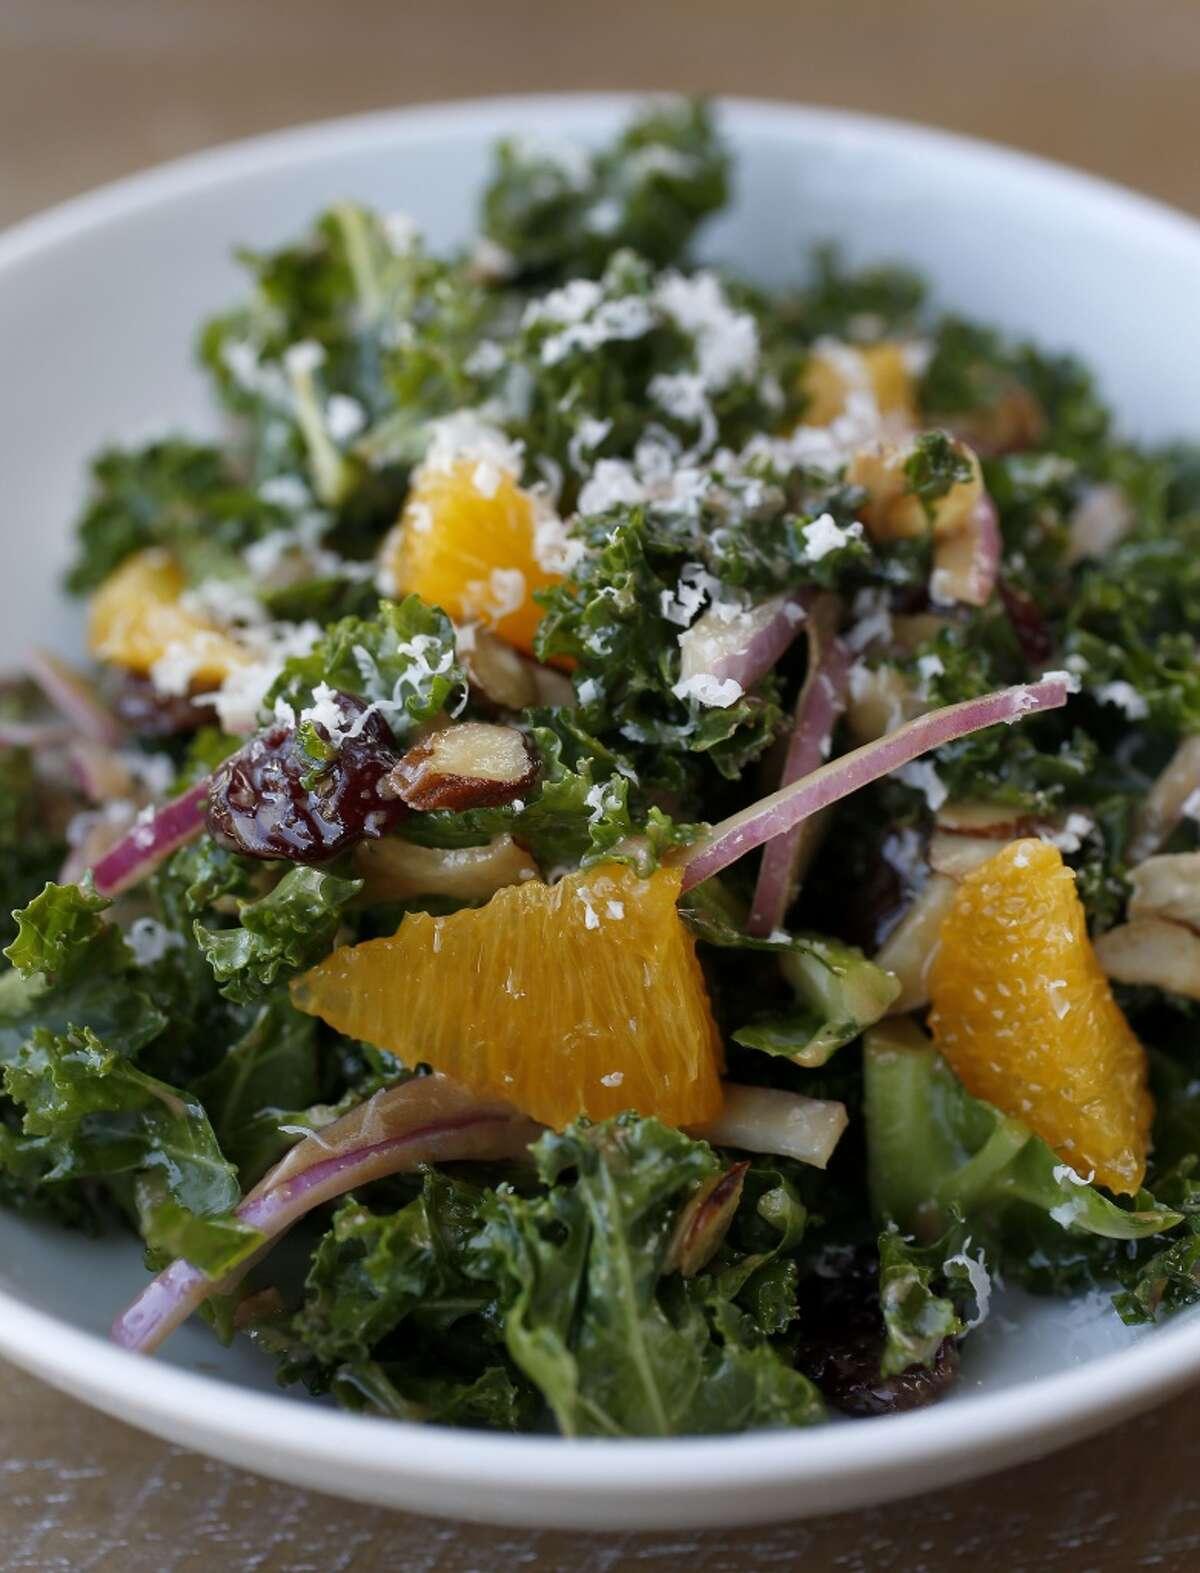 Bosta Wine & Coffee Cuisine: Contemporary American Dish: marinated Kale Salad Entree price range: $ Where: 1801 Binz, Suite 130 Phone: 713-533-9560 Website: bostahouston.com